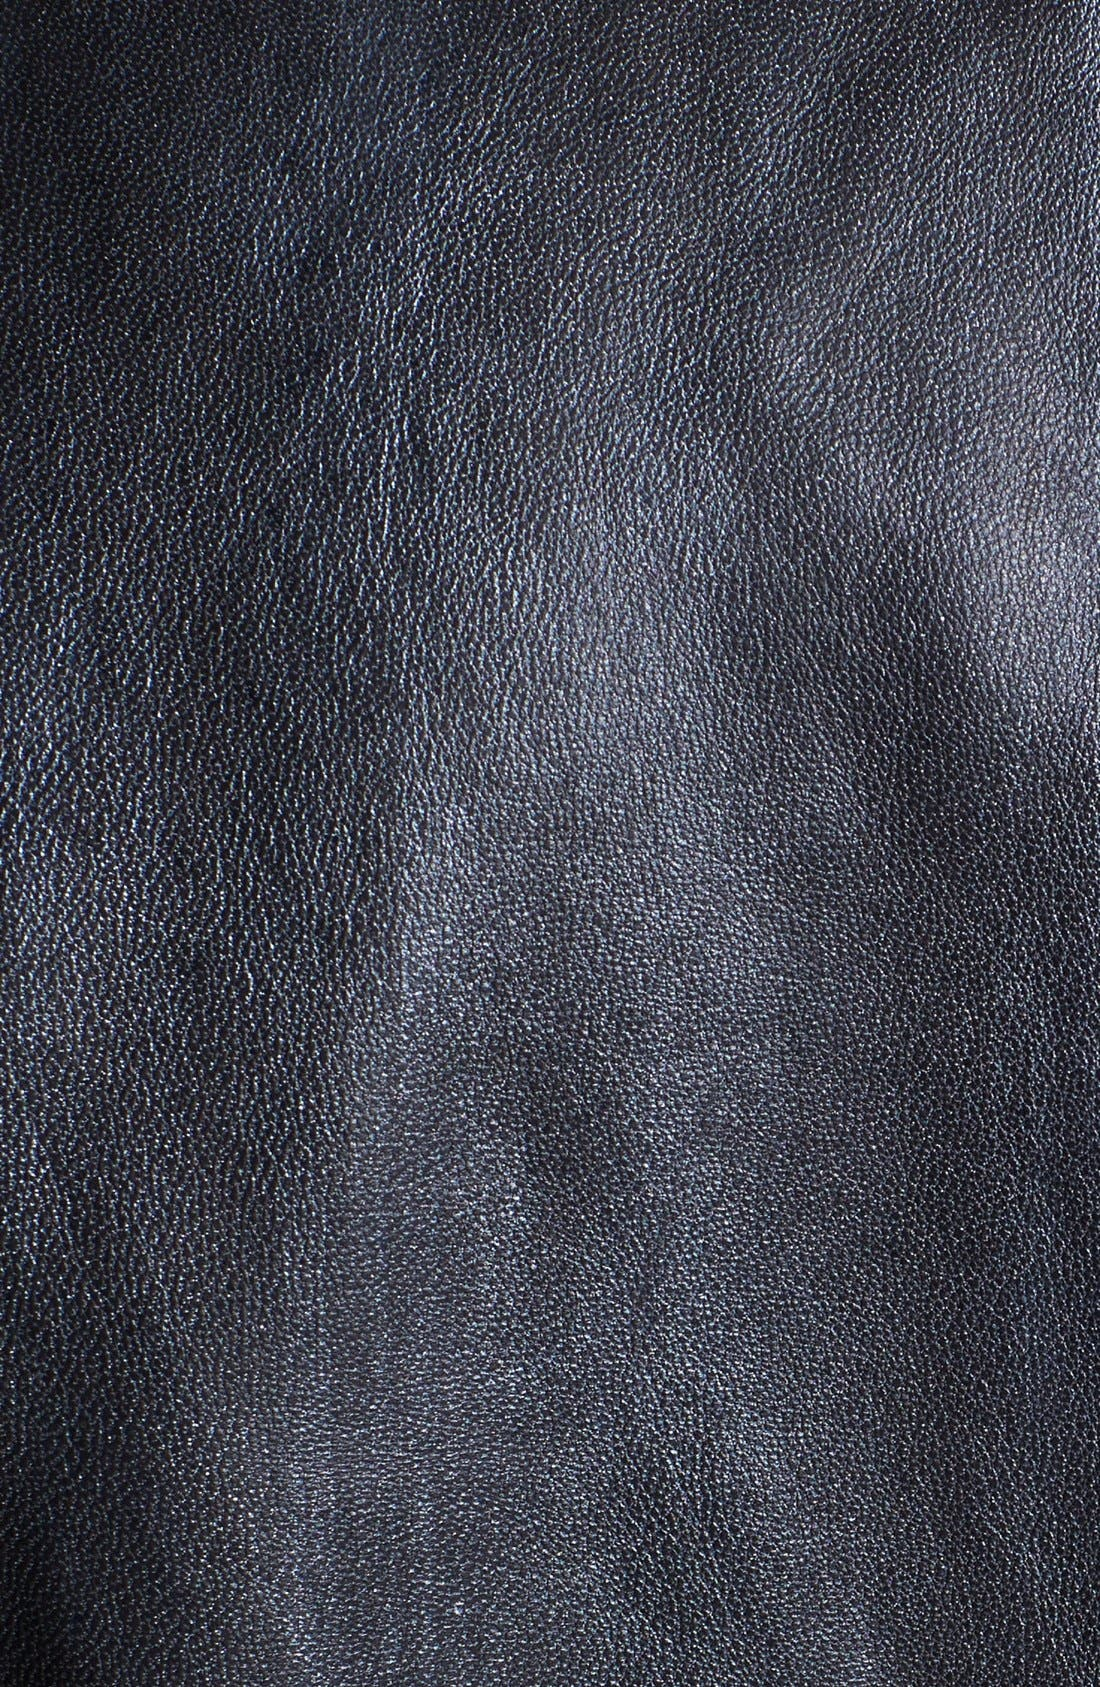 Alternate Image 3  - Kenneth Cole Collection Metallic Leather Moto Jacket